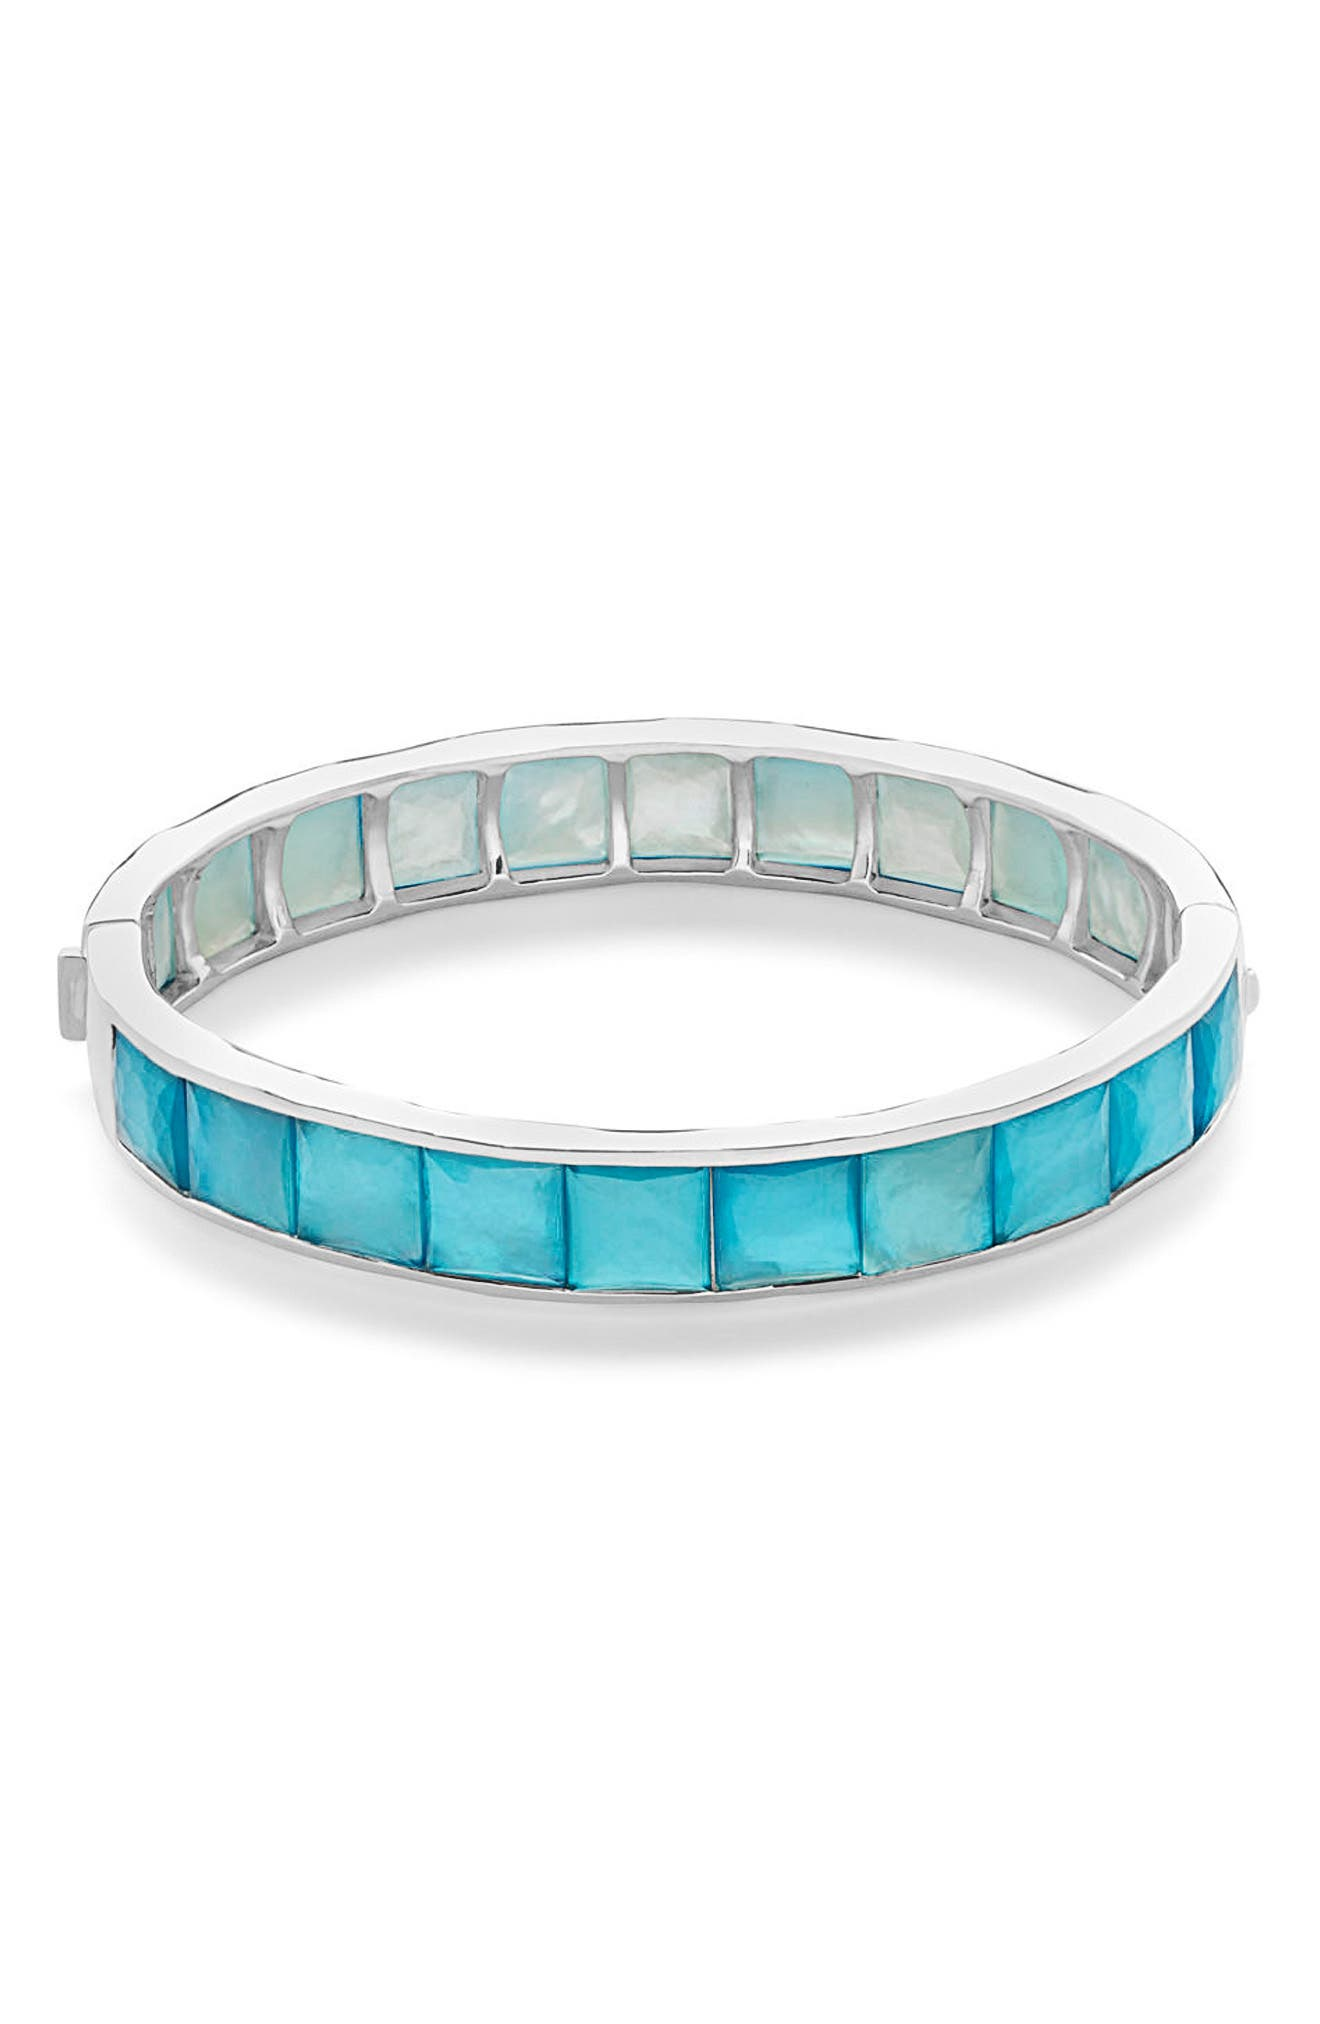 Wonderland Bracelet,                             Main thumbnail 1, color,                             ICE